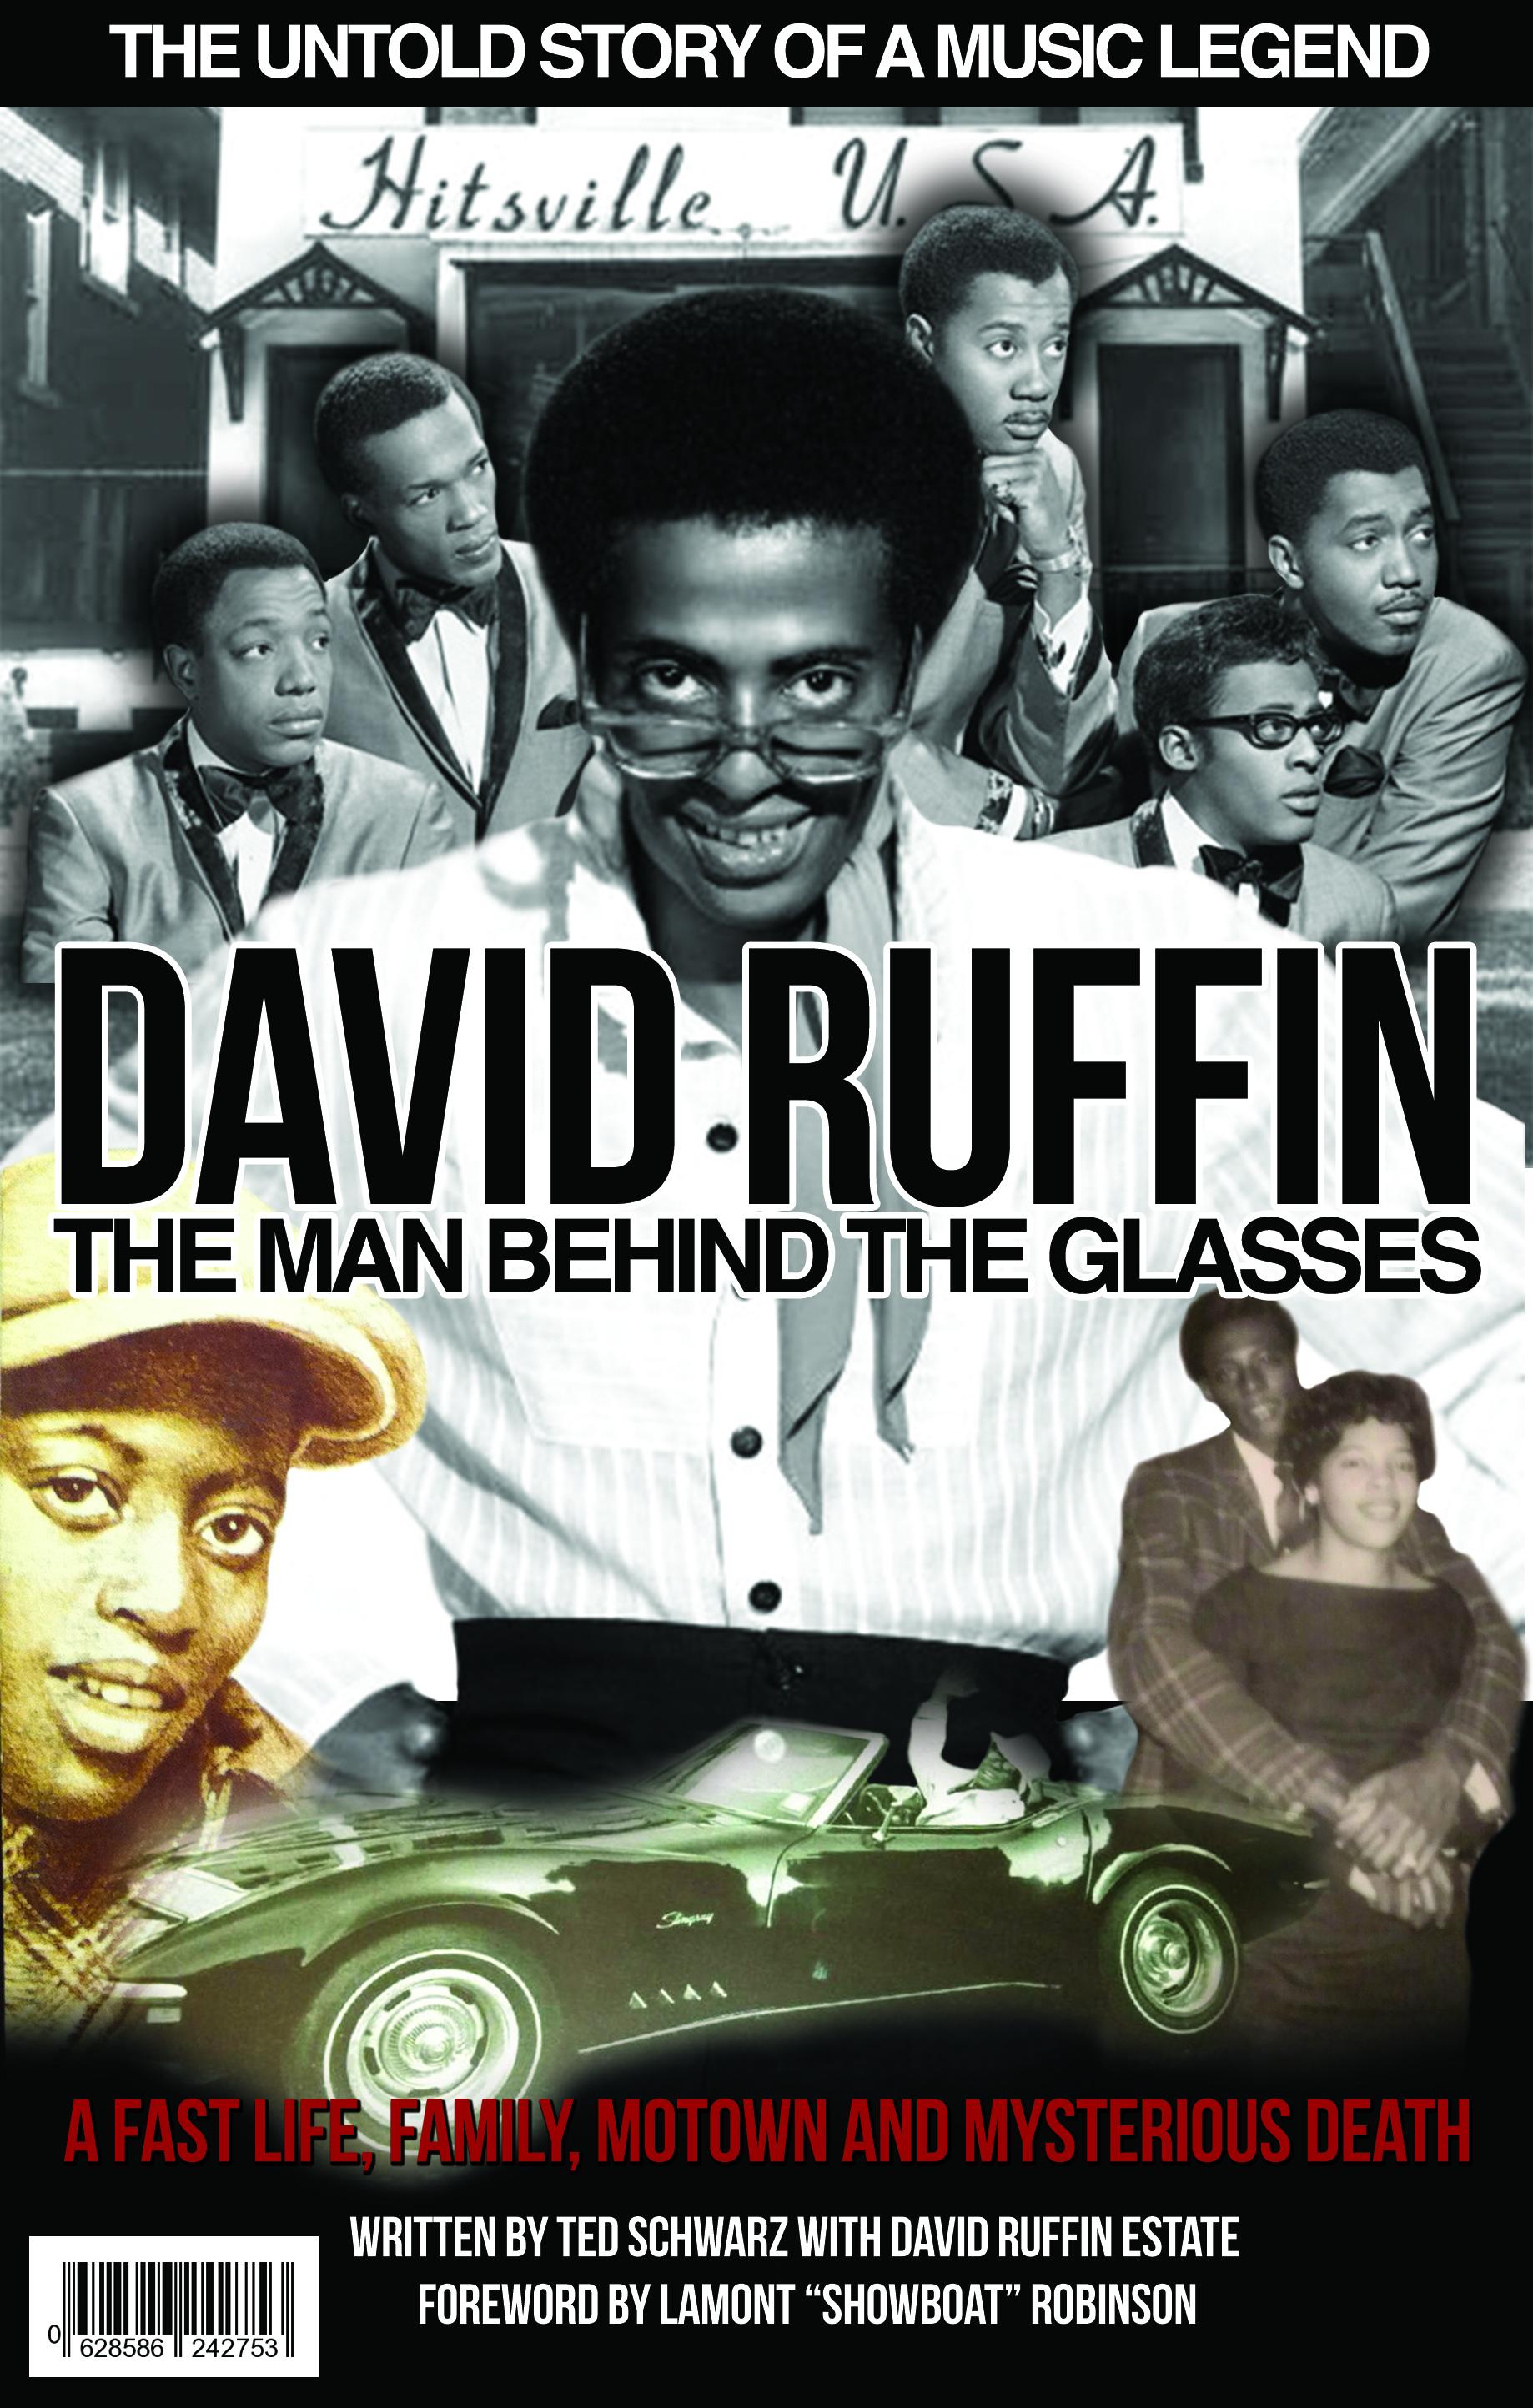 David Ruffin & Eddie Kendricks - I Couldn't Believe It